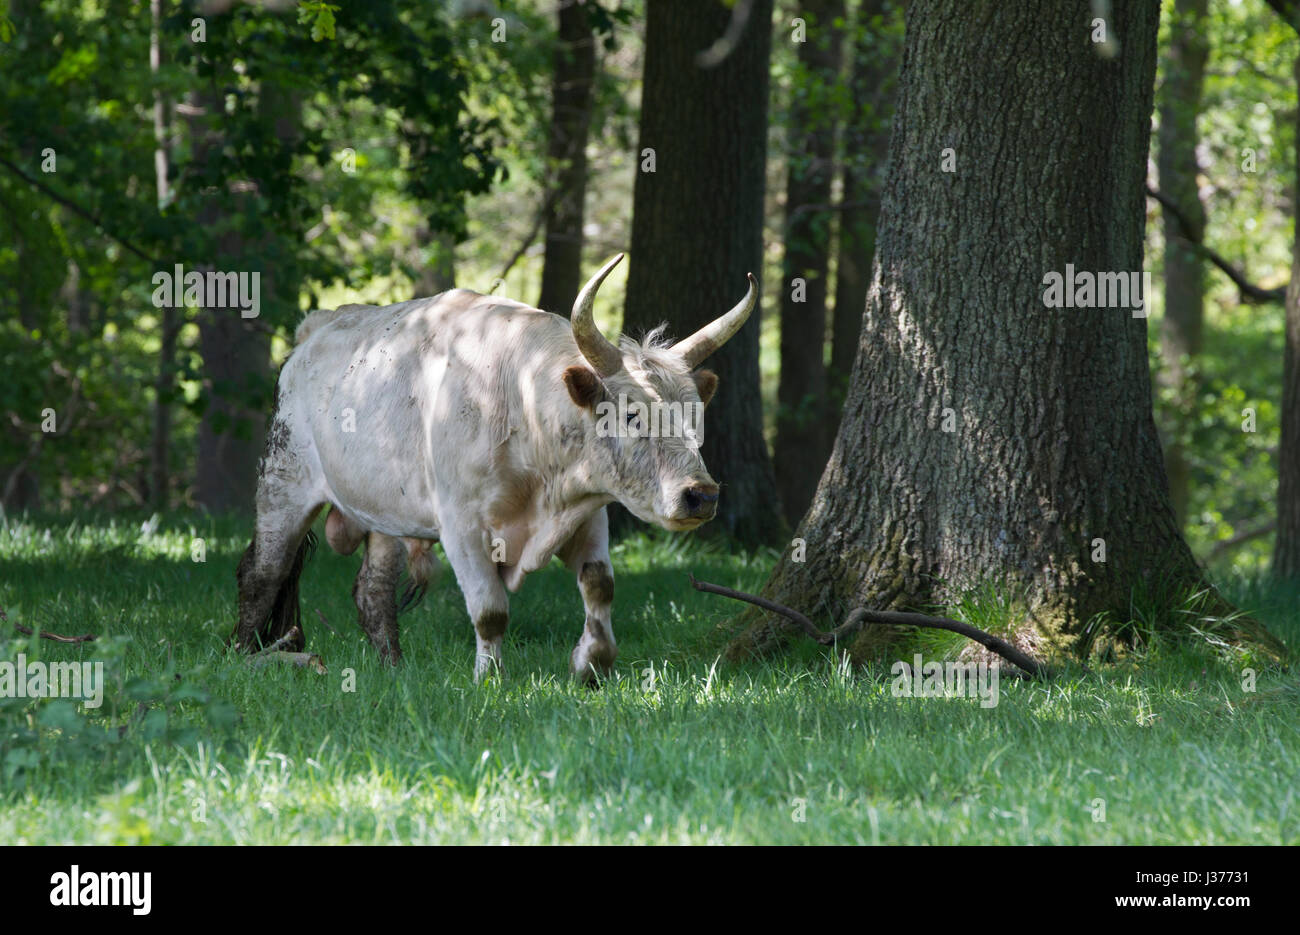 Chillingham  Wild White Cattle,  single adult male walking in woodland. Chillingham Estate, Northumberland, UK. - Stock Image